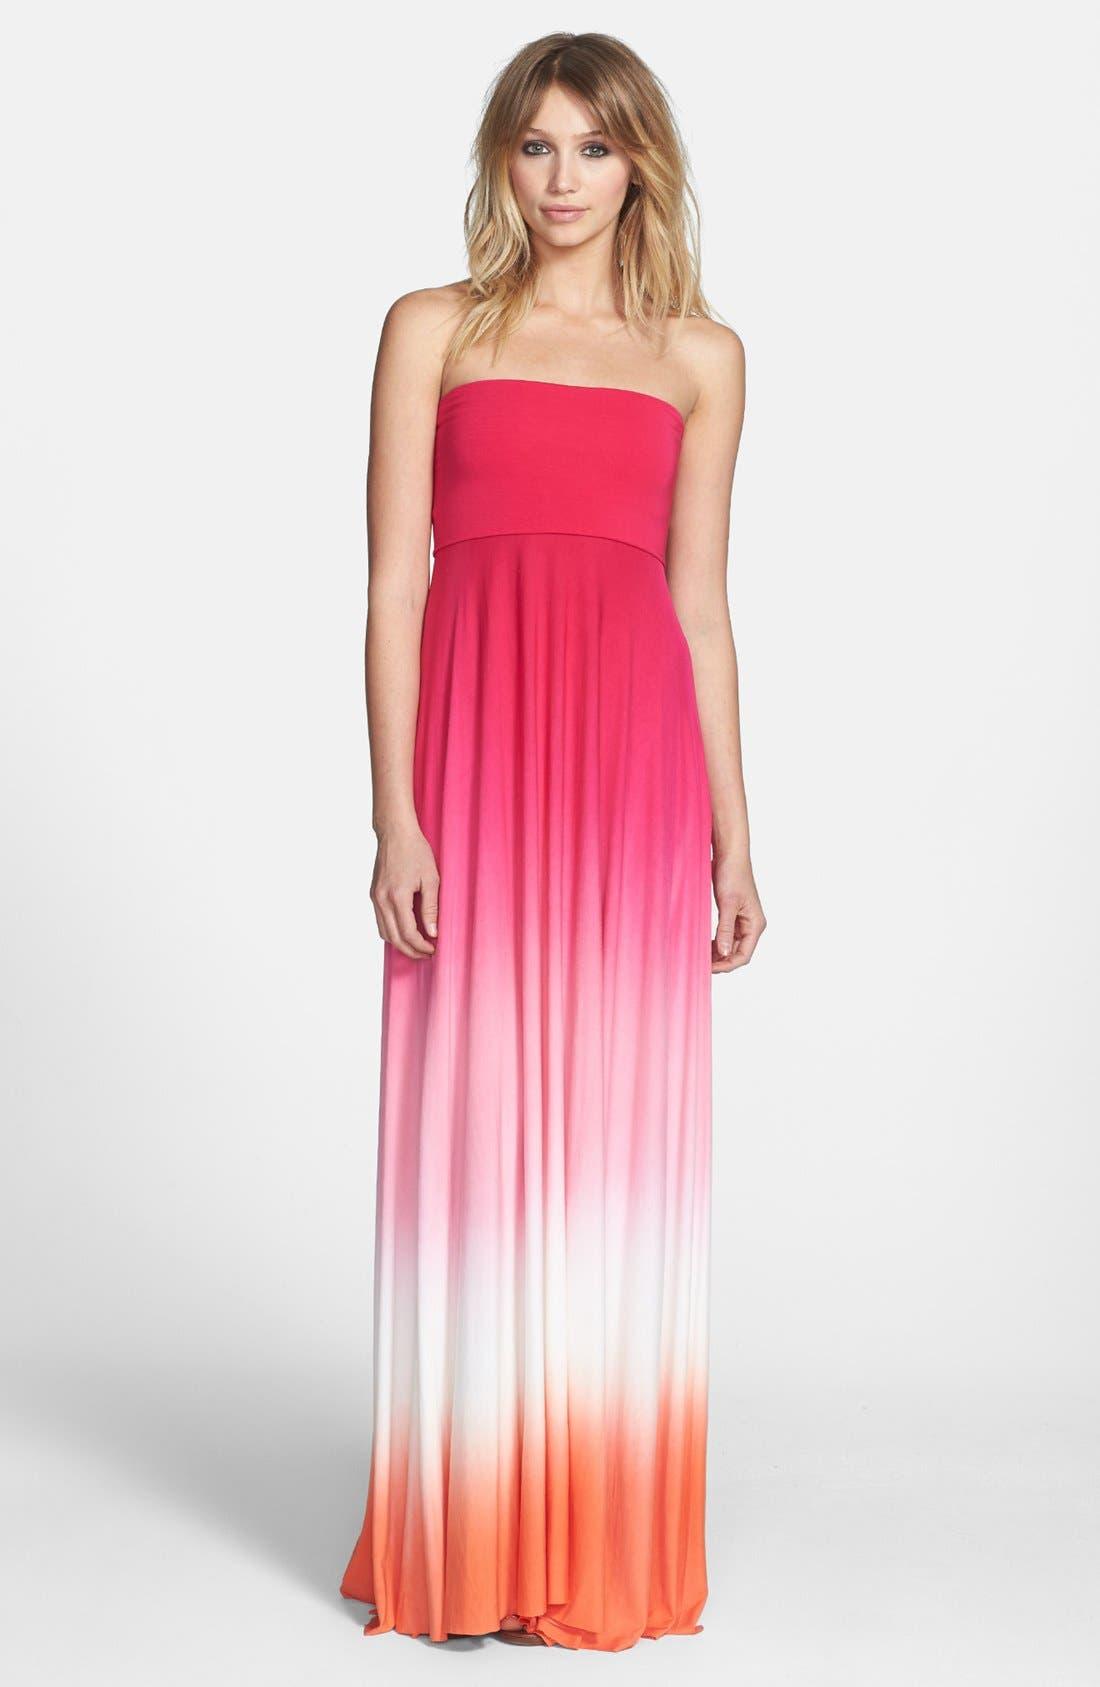 Alternate Image 1 Selected - Young, Fabulous & Broke 'Bangal' Convertible Maxi Dress